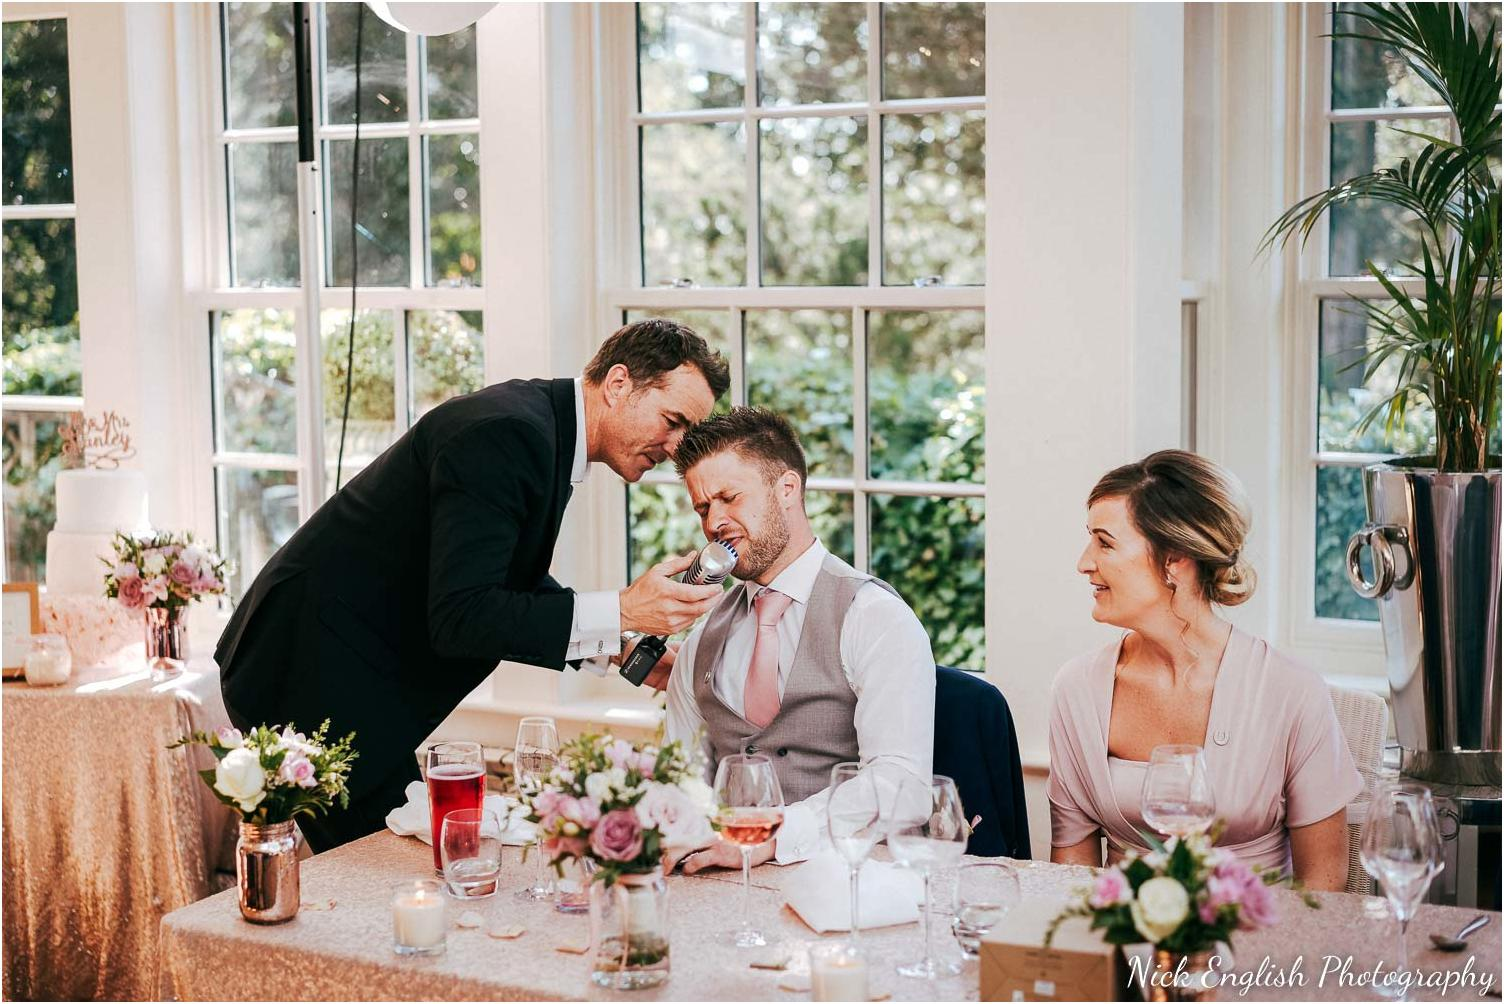 Mitton_Hall_Wedding_Photograph-127.jpg